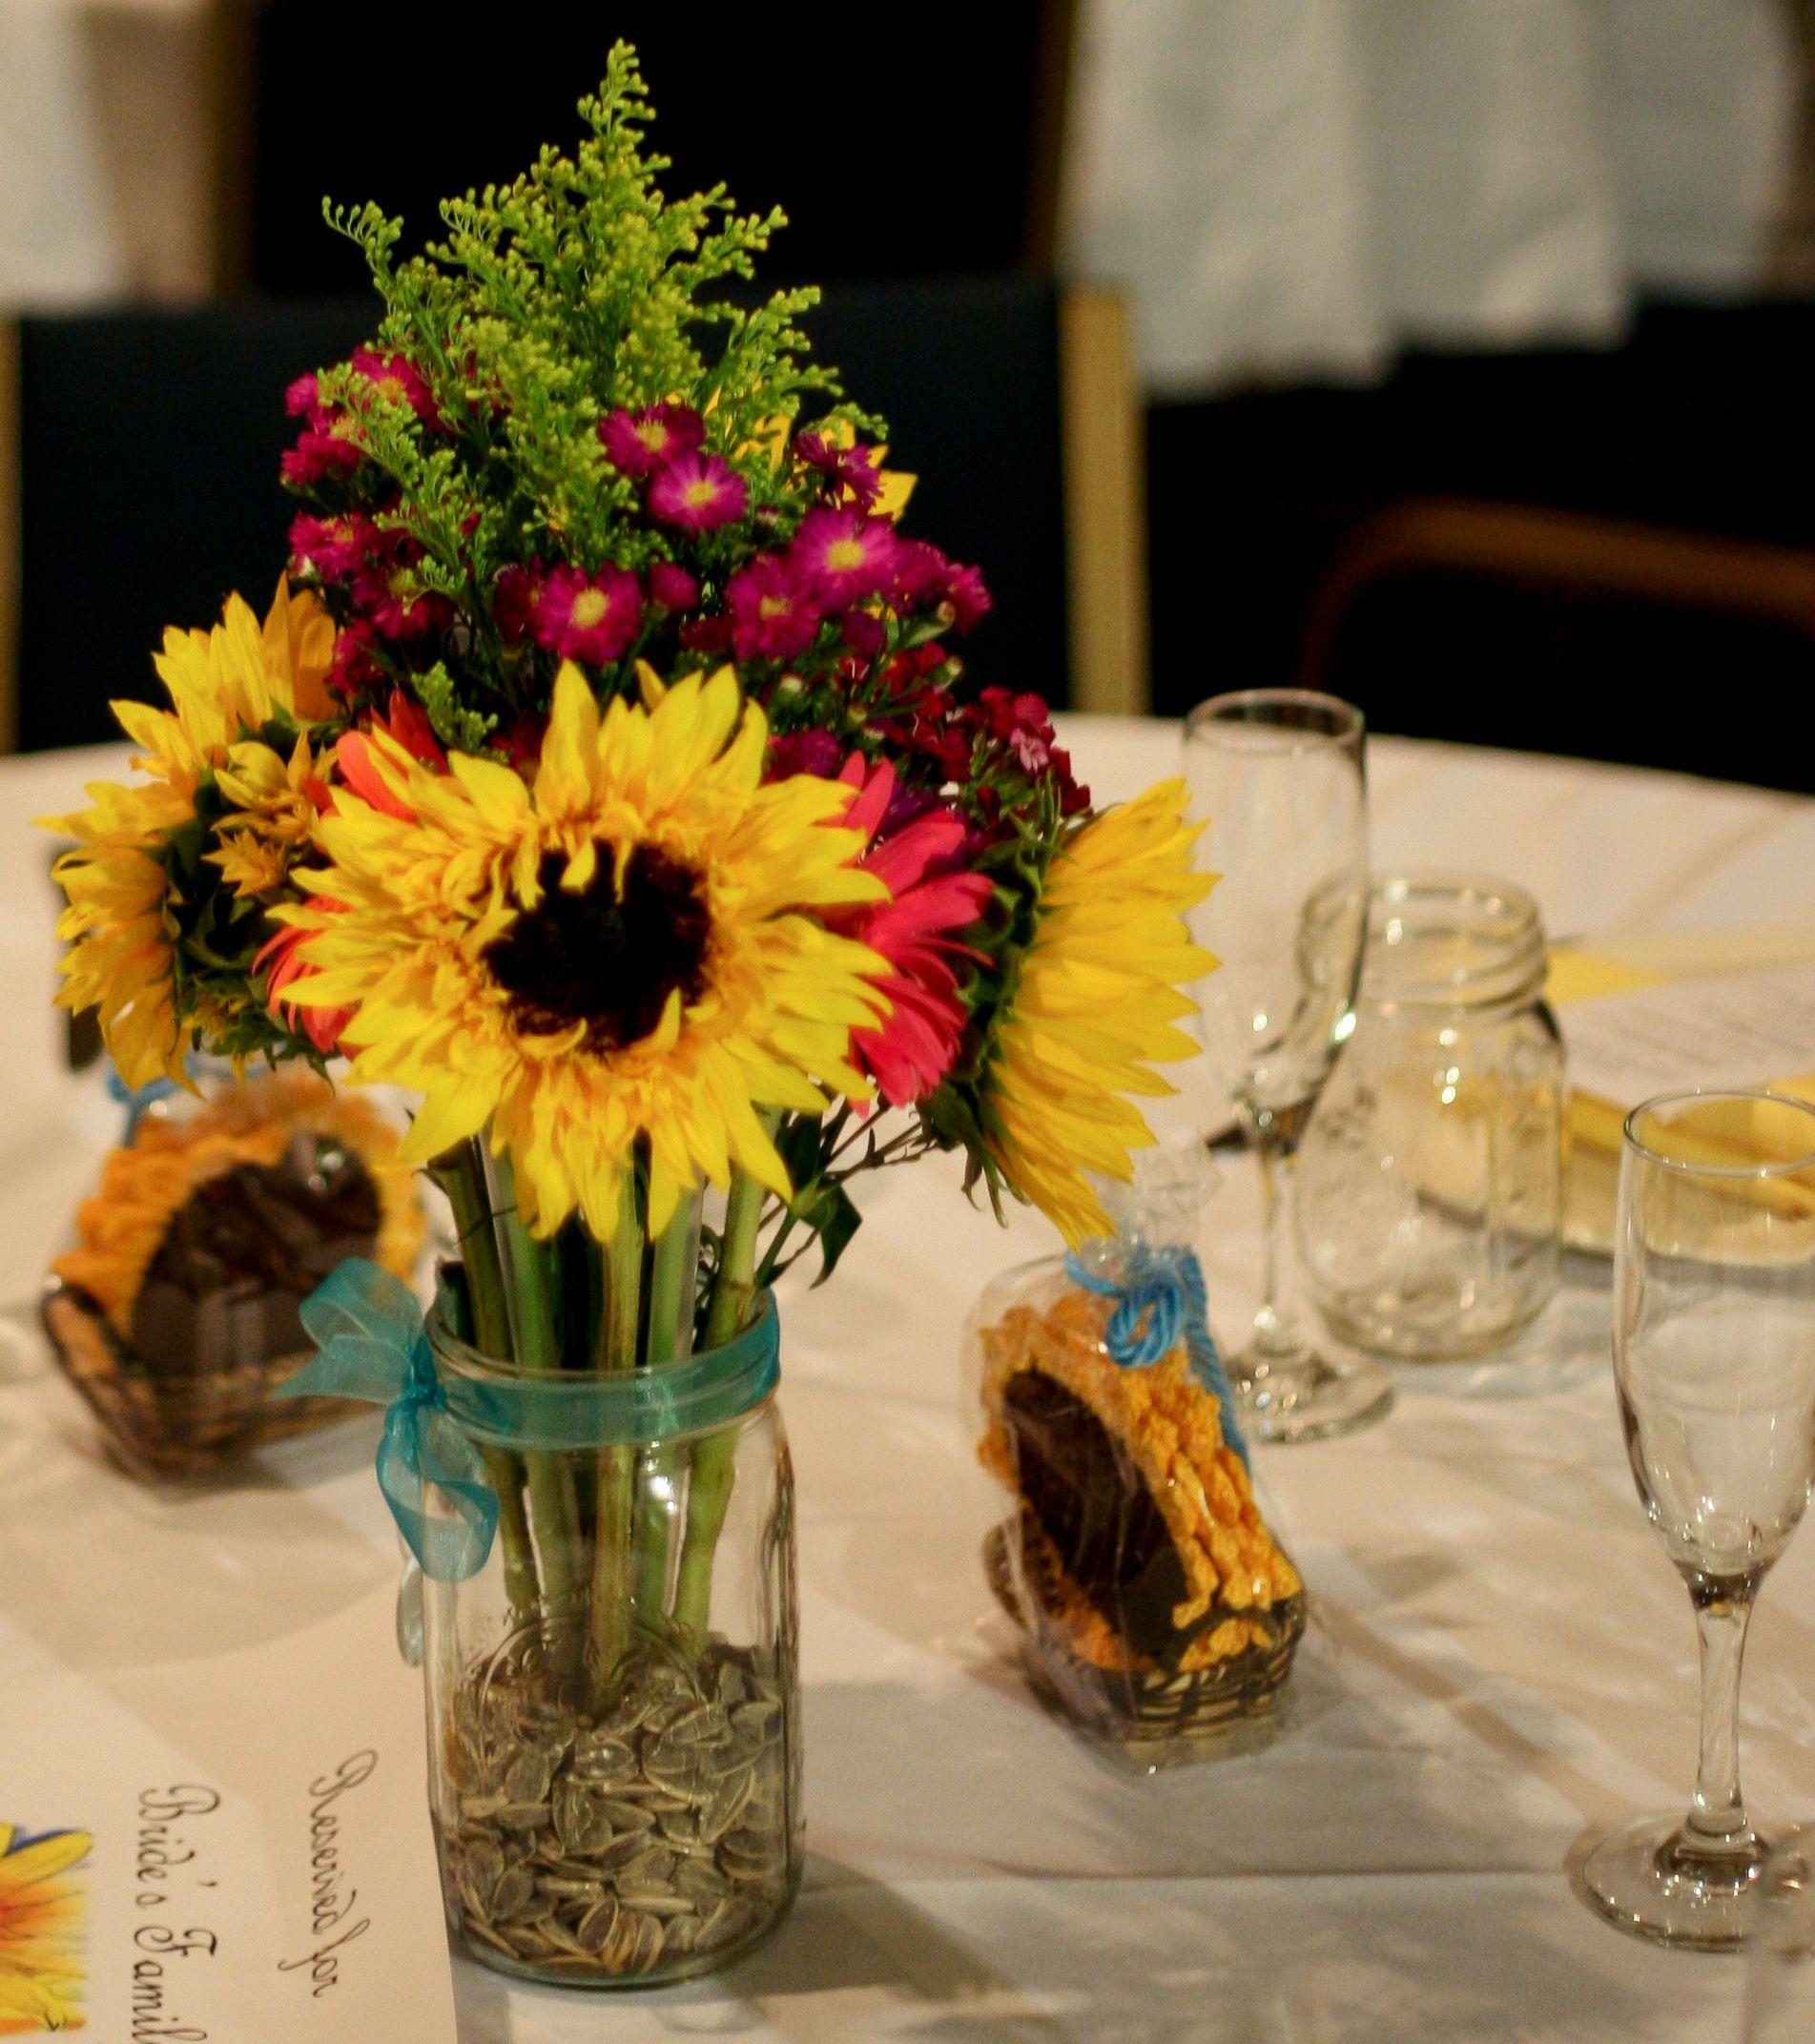 Wedding Flowers In Mason Jars: Mason Jar And Sunflower Theme. Use Smaller Mason Jars For